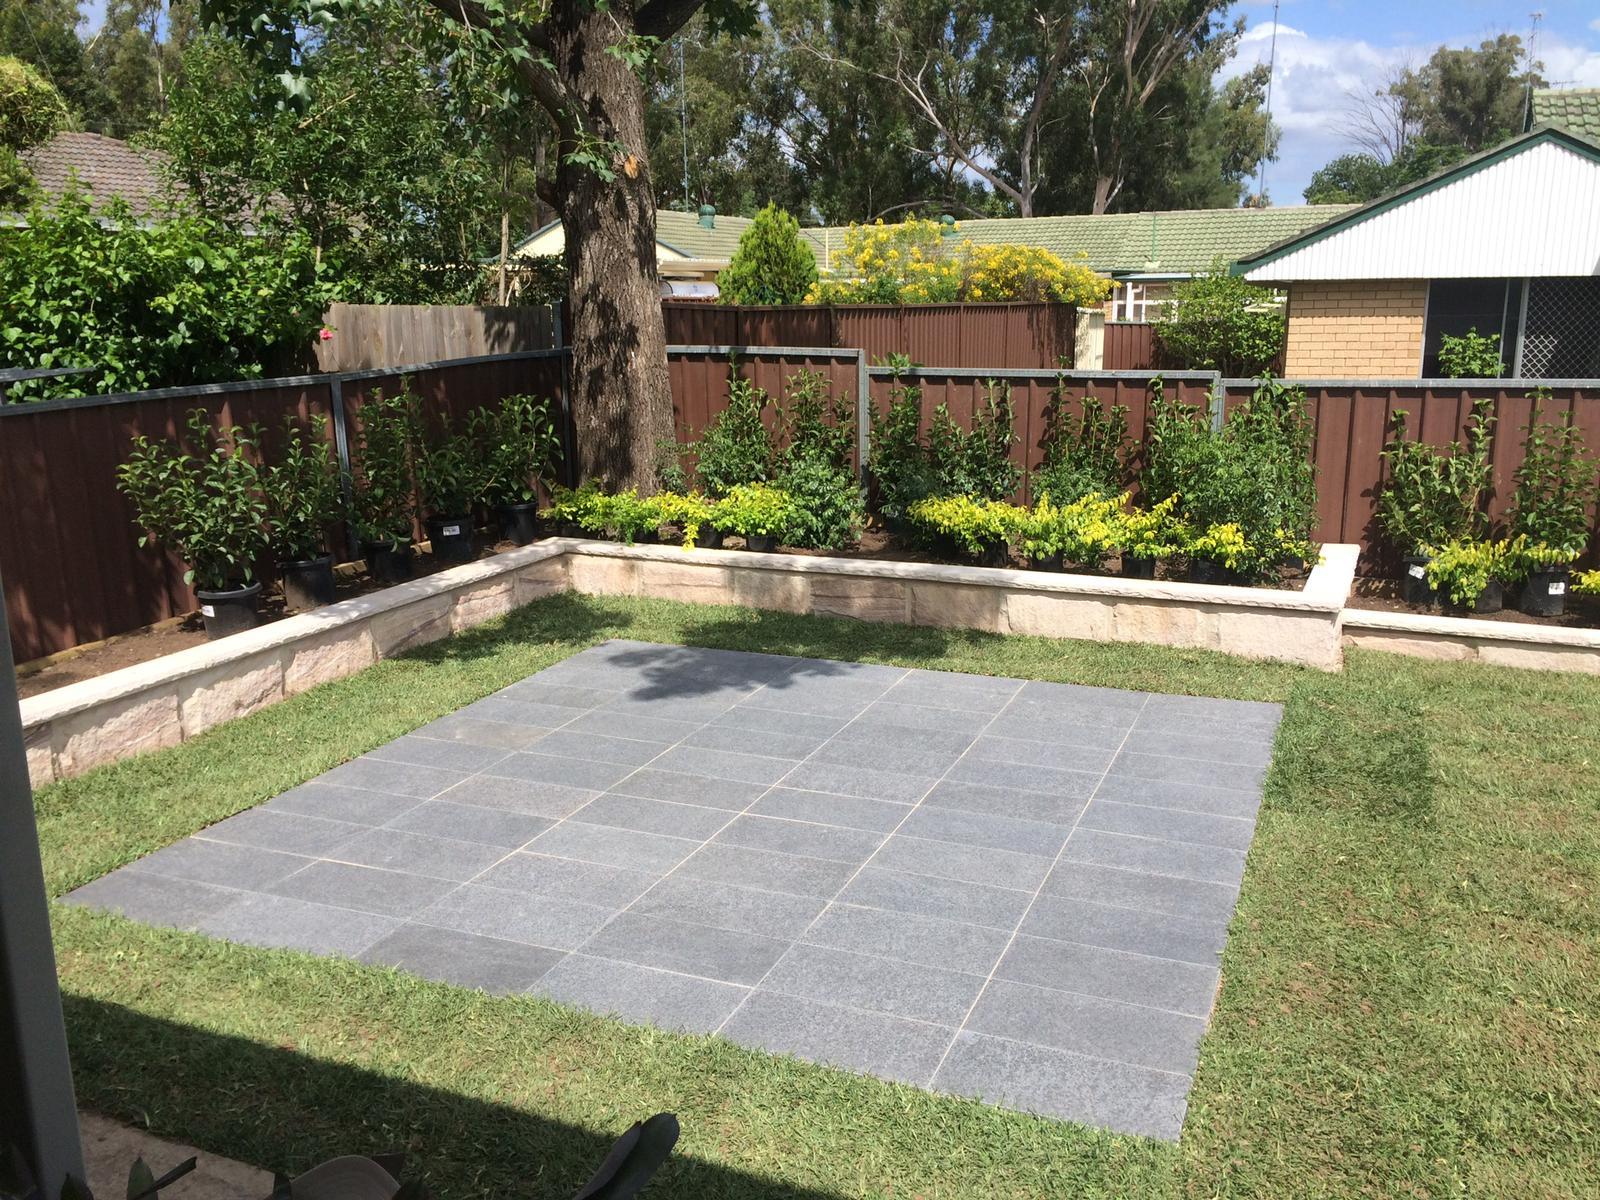 Garden centerpiece with stone paving